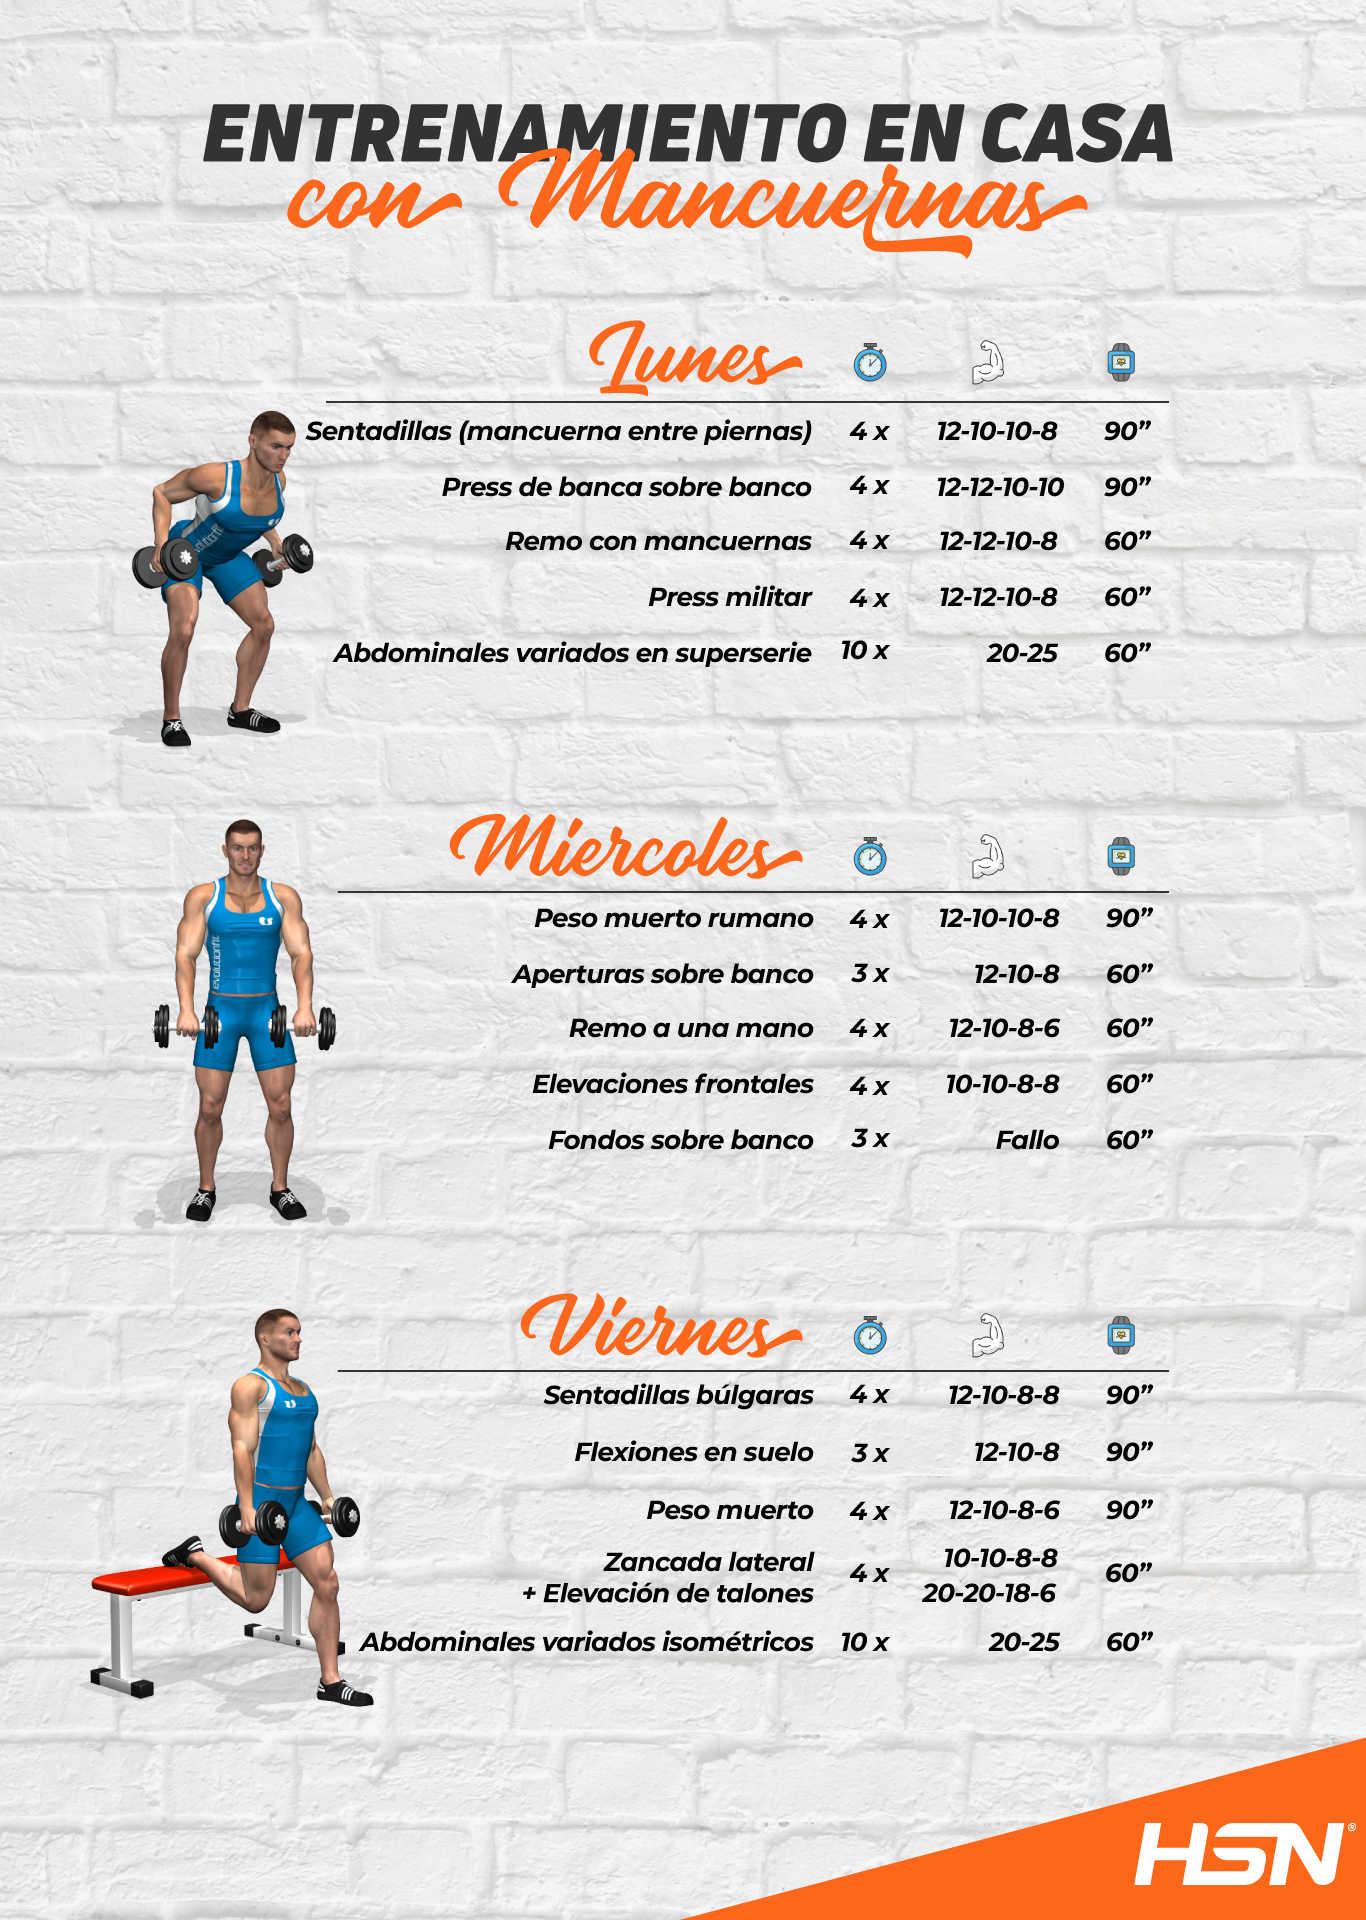 rutina de ejercicios casera para hombres